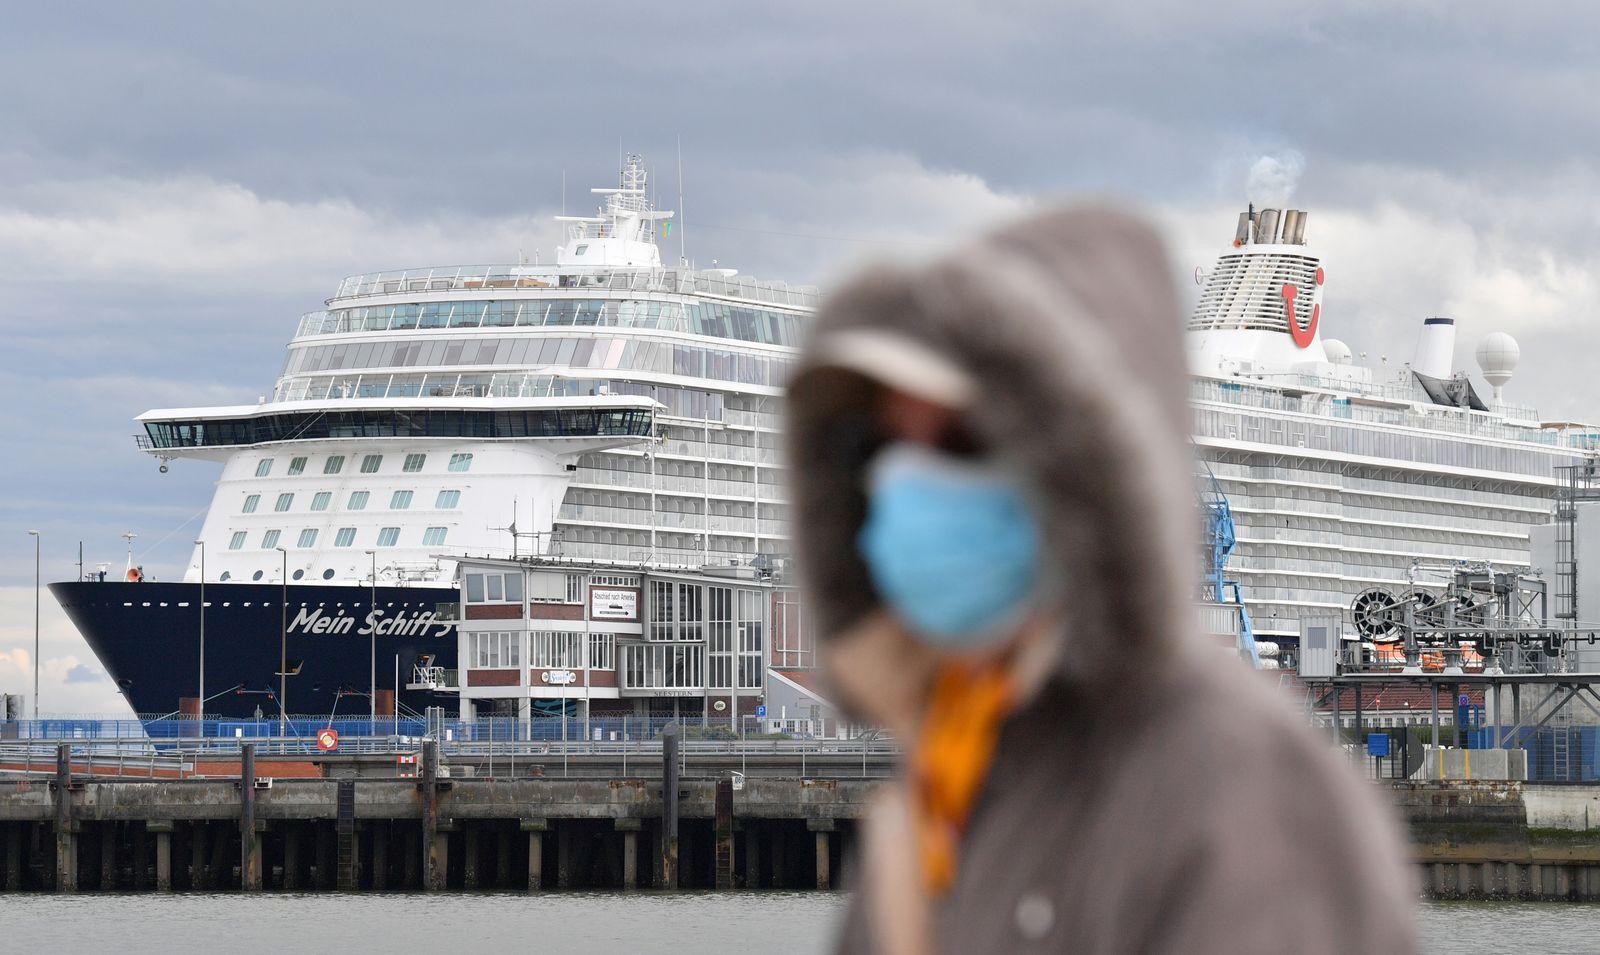 TUI Cruise Ship Under Quarantine Following Positive Covid-19 Infection